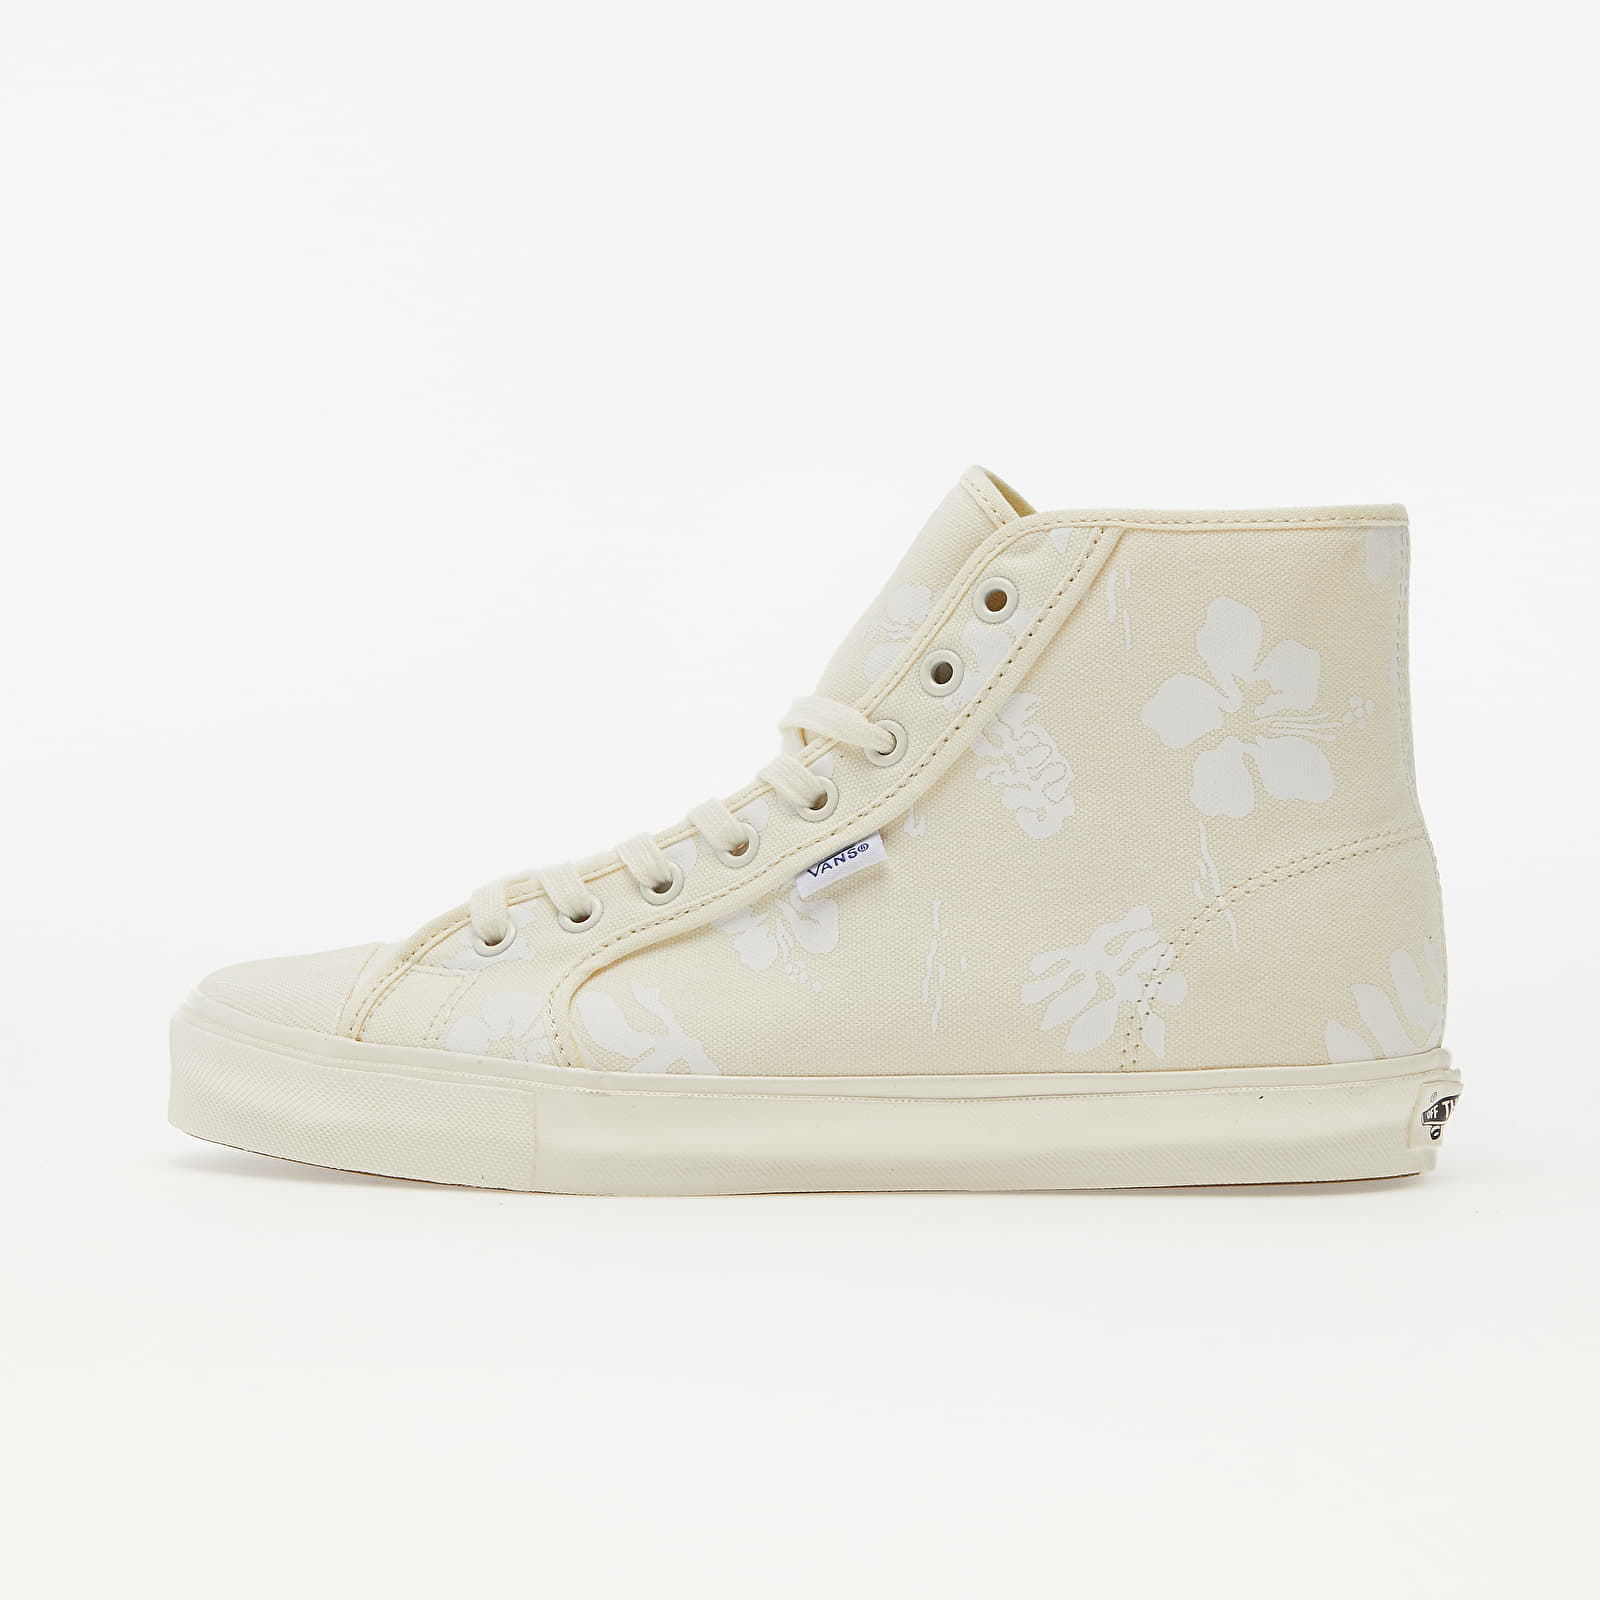 Vans Vault OG Style 24 LX (Canvas) Hibiscus/ Classic White VN0A5HUT5J51